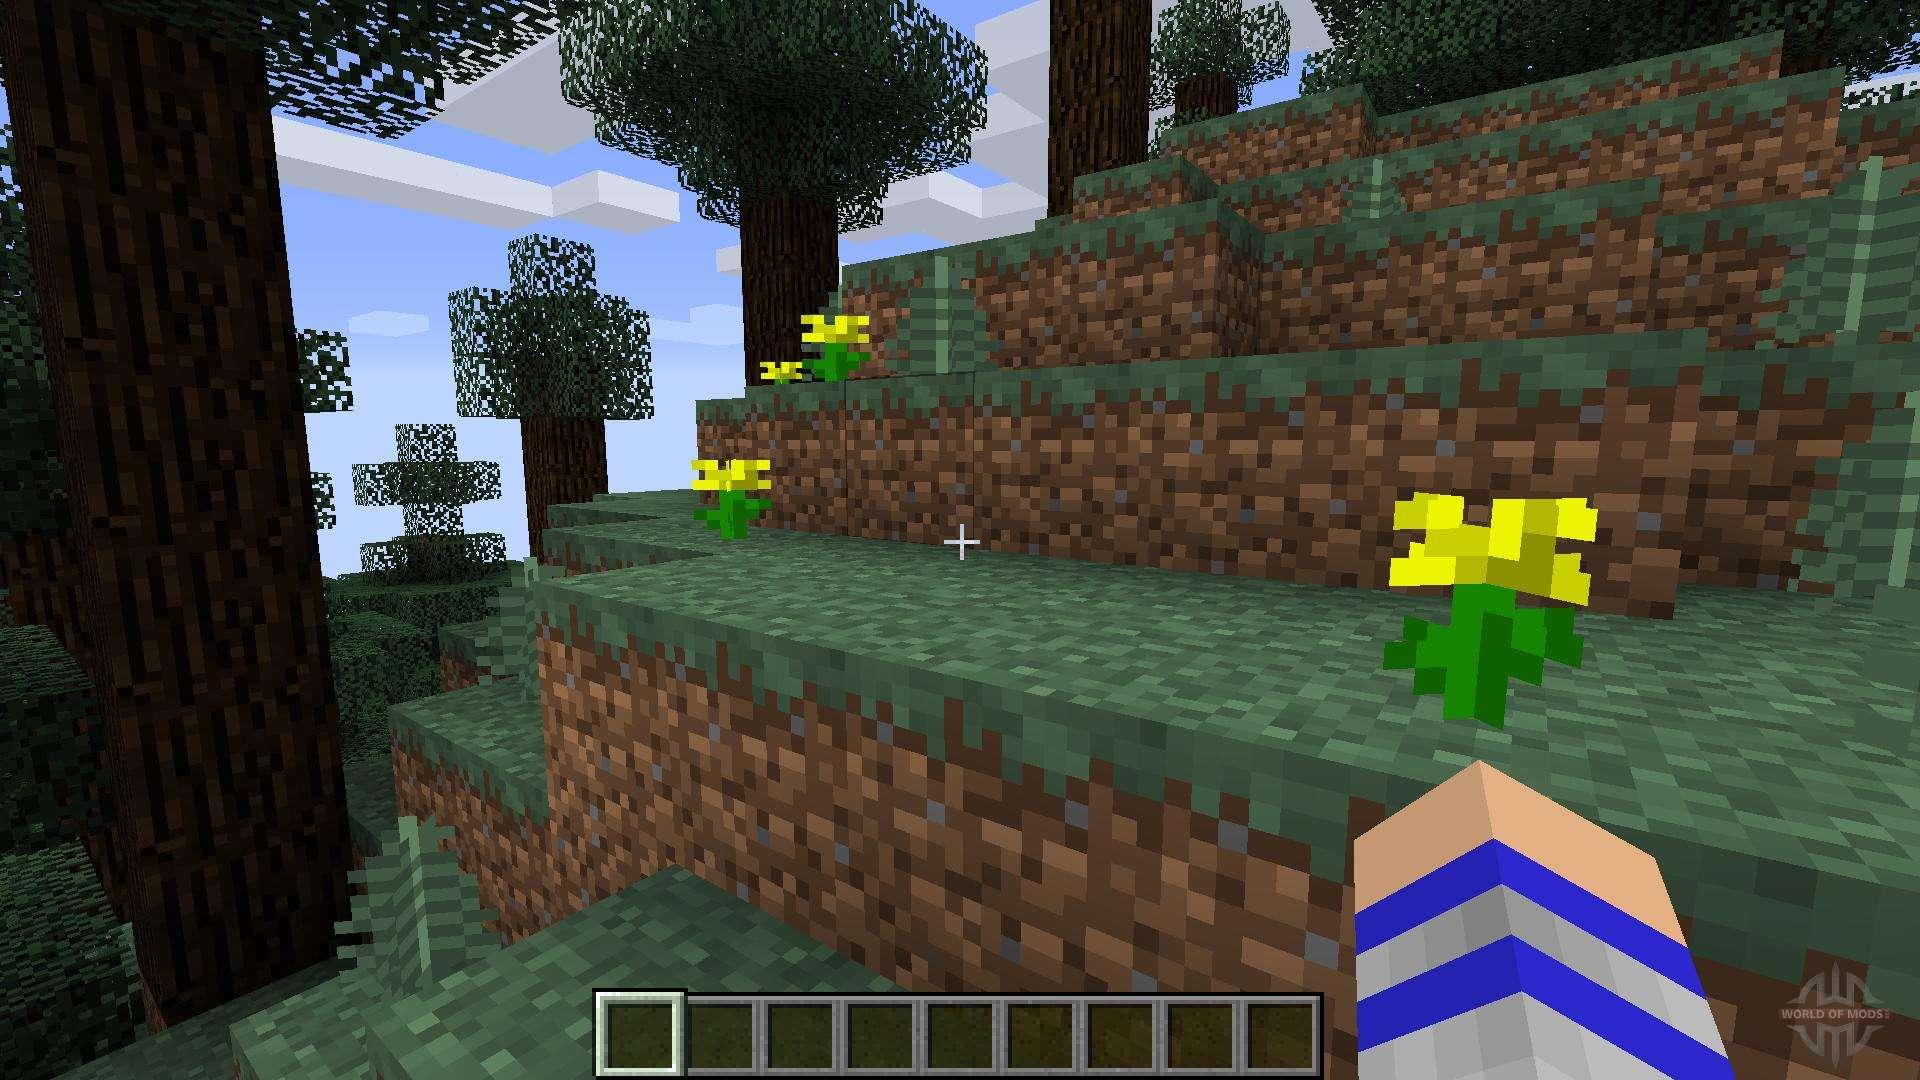 download minecraft 1.7 2 free full version pc